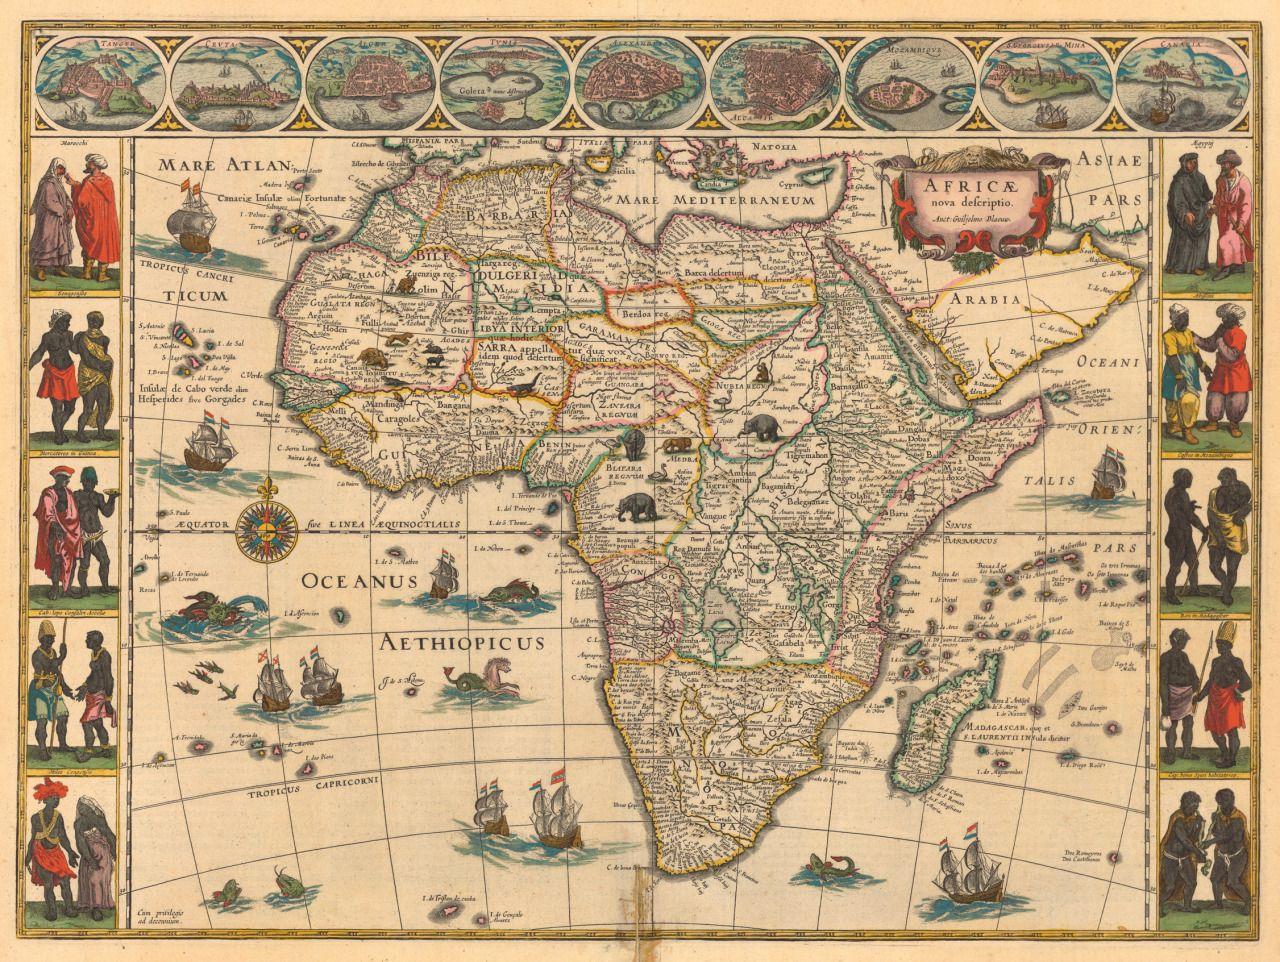 diasporicroots u201c 1644 map of Africa Made